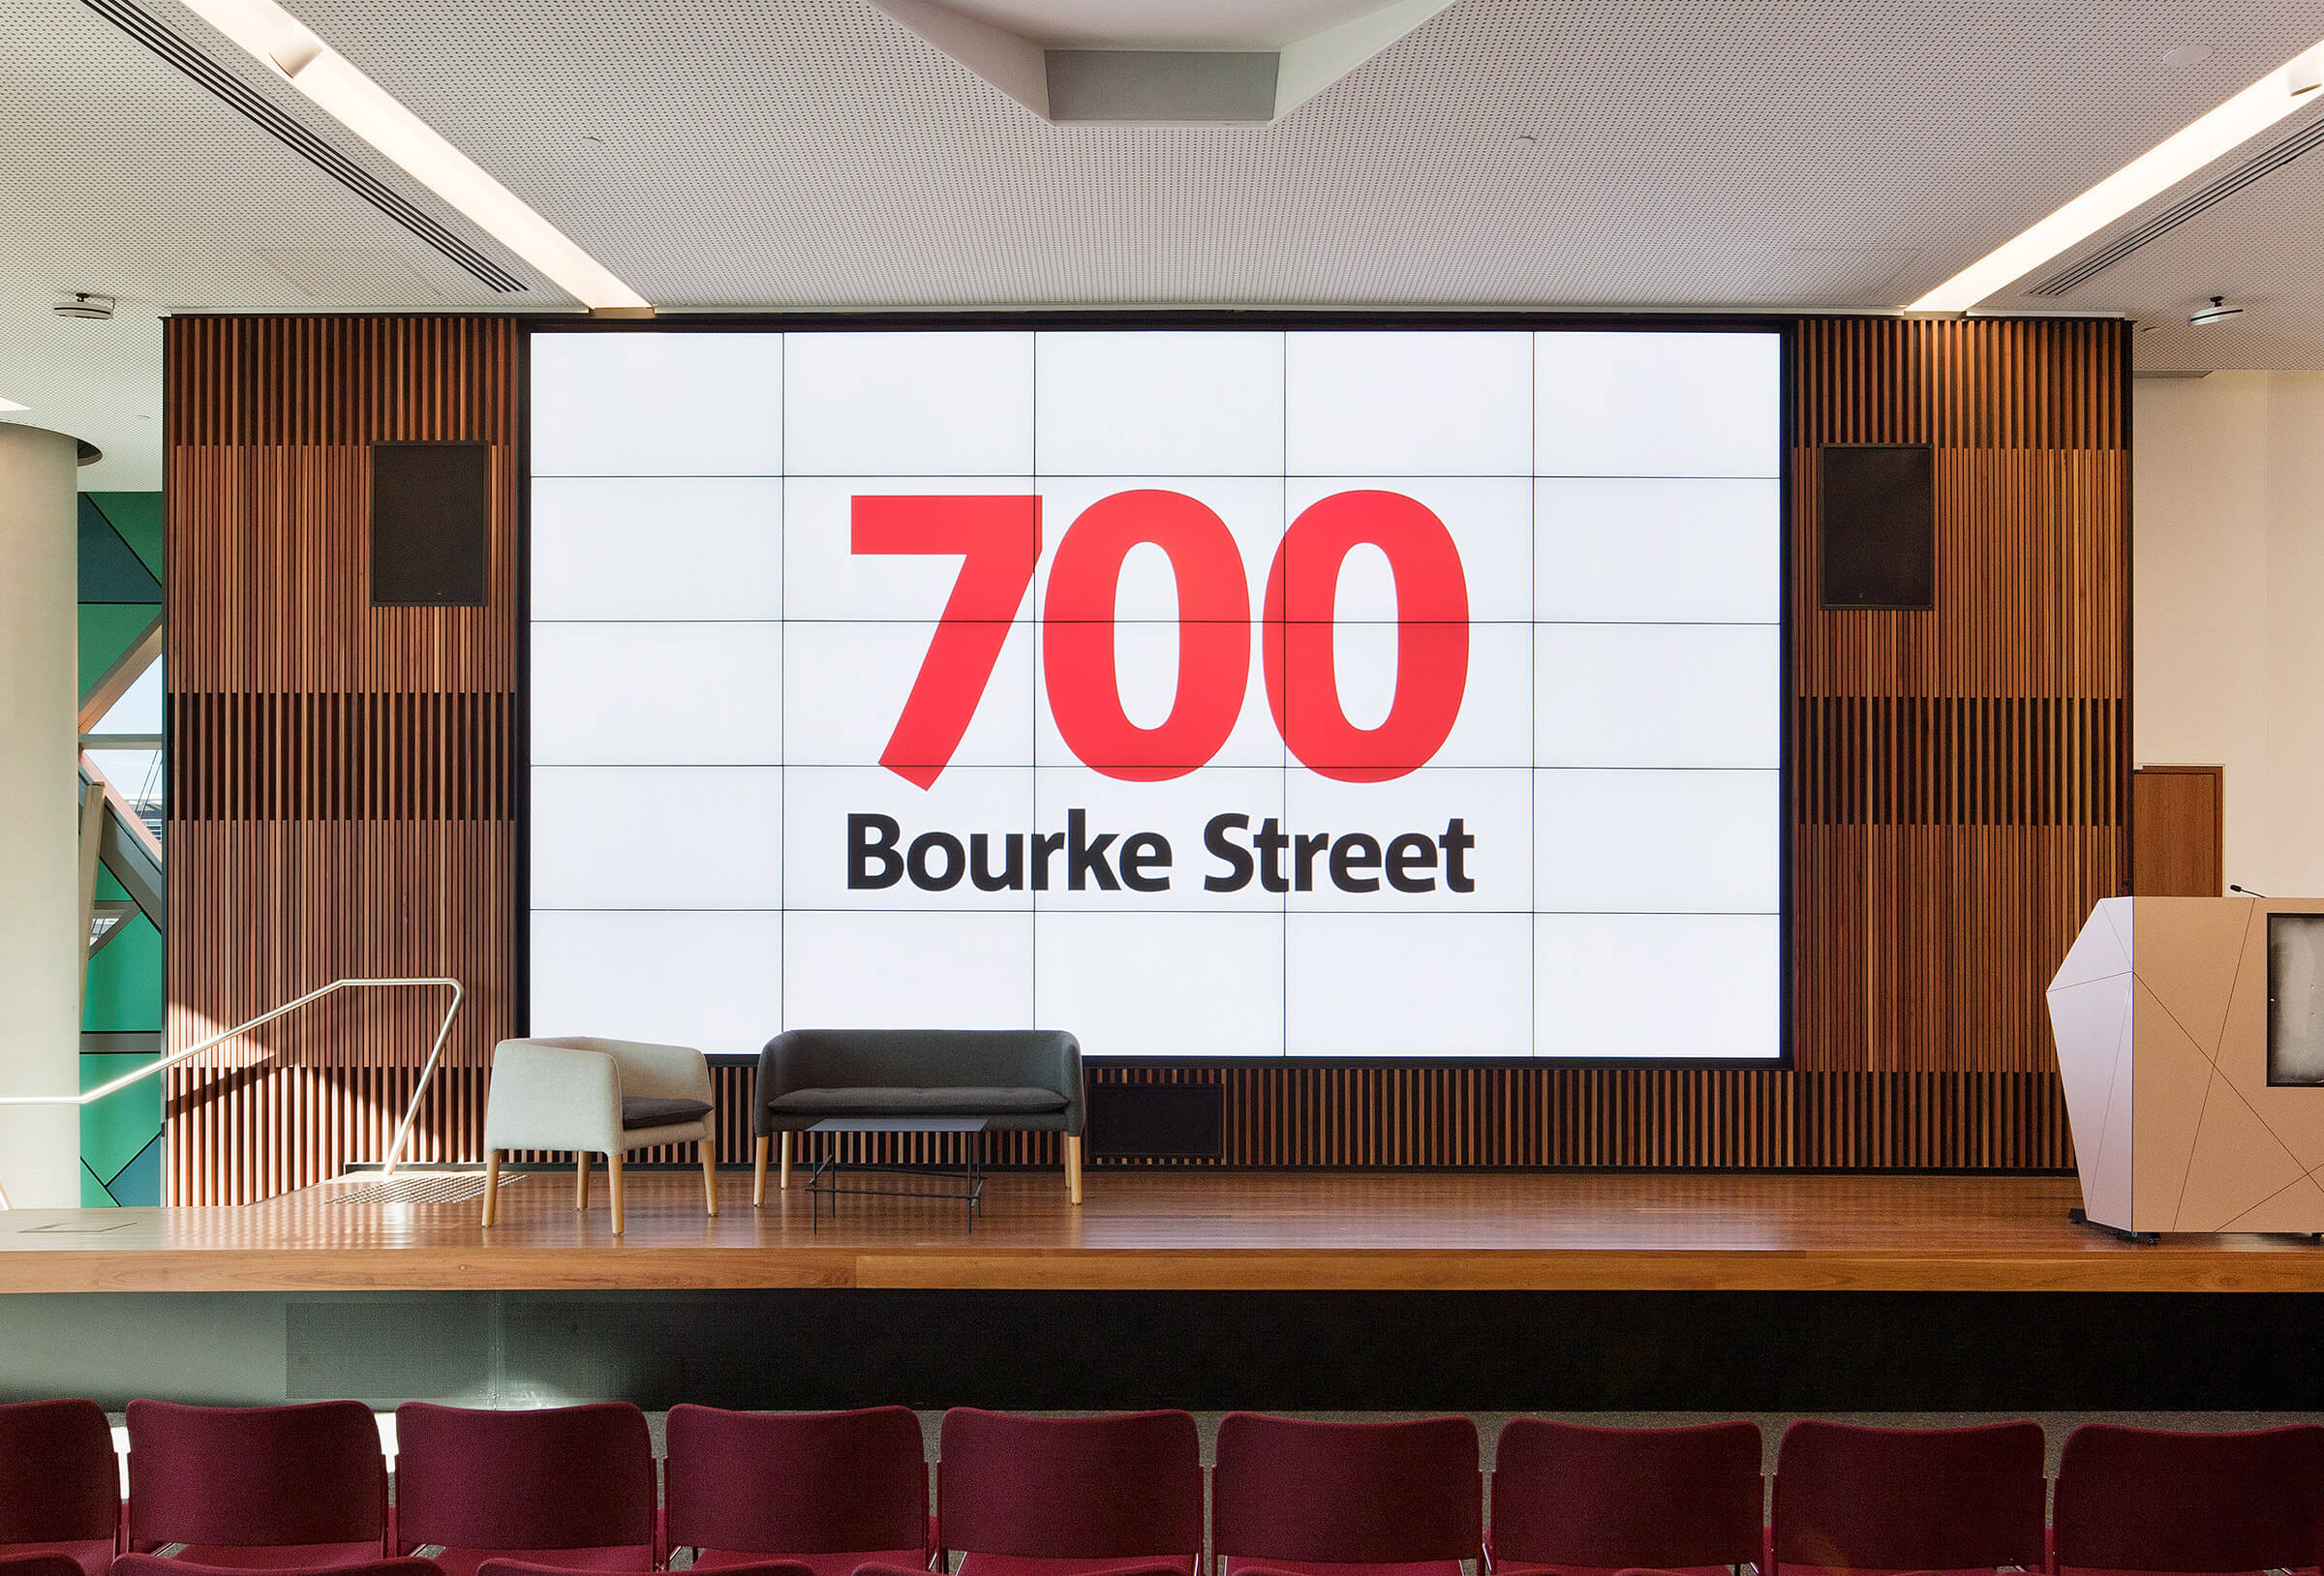 Sculptform NAB 700 Bourke Street